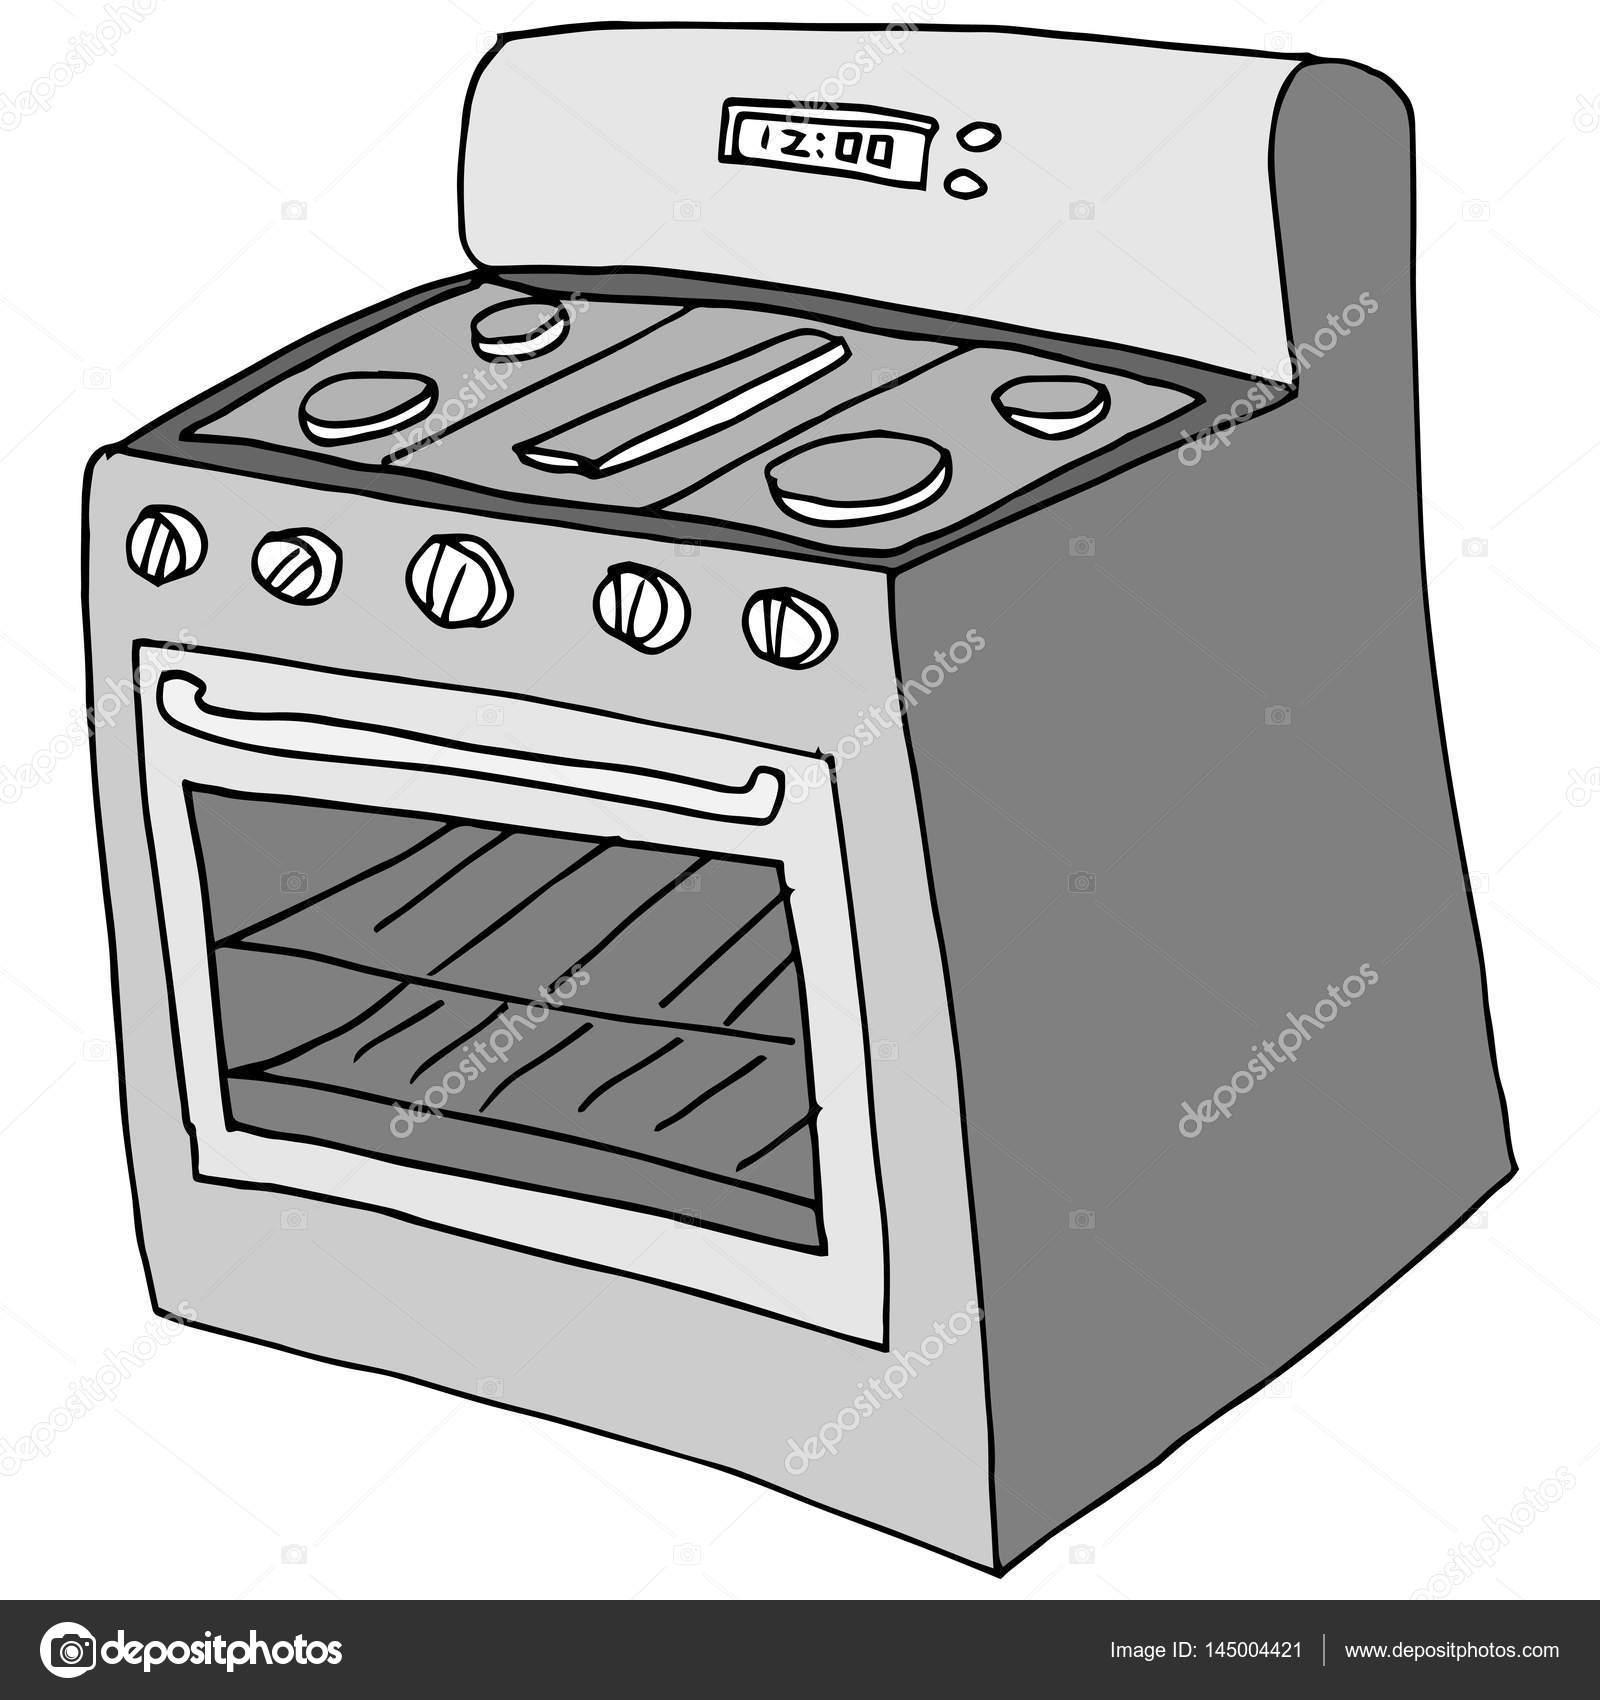 Retro cocina dibujo vector de stock cteconsulting for Cocina dibujo